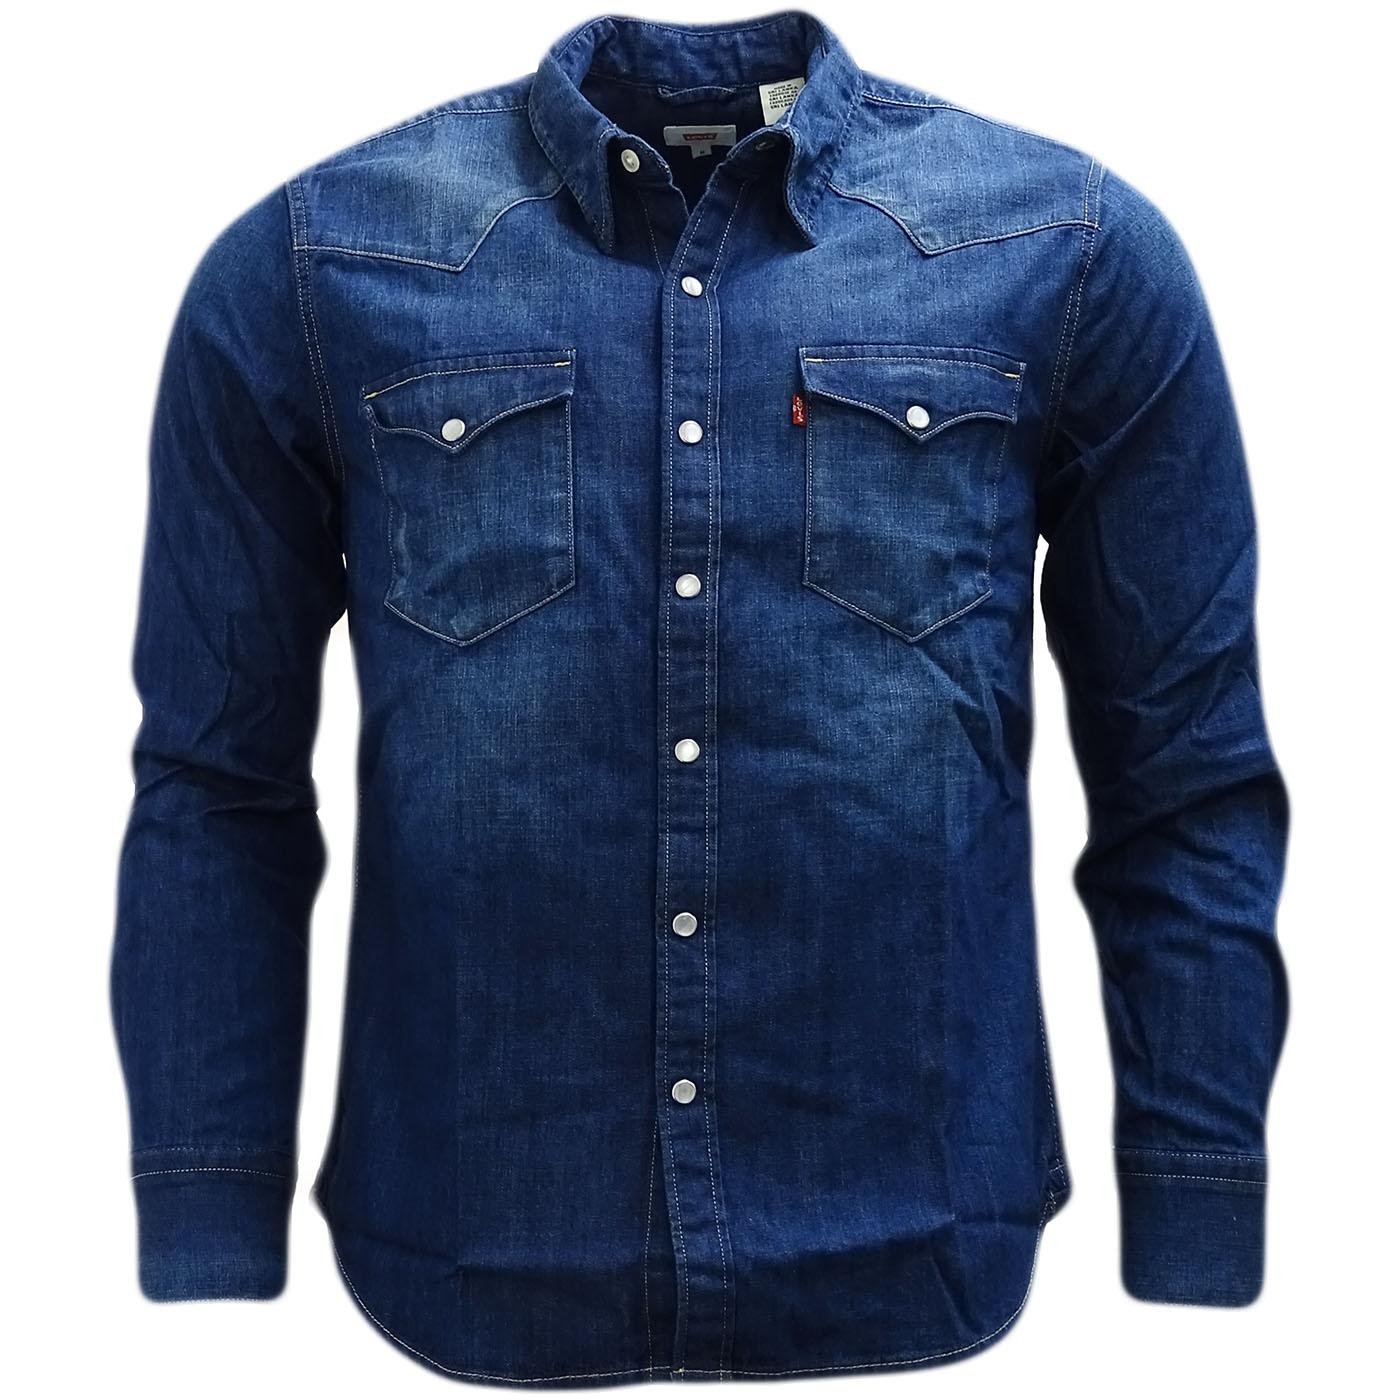 Chemise Jeans Levis tout levi strauss western shirt / popper front denim shirt - 65816 | ebay